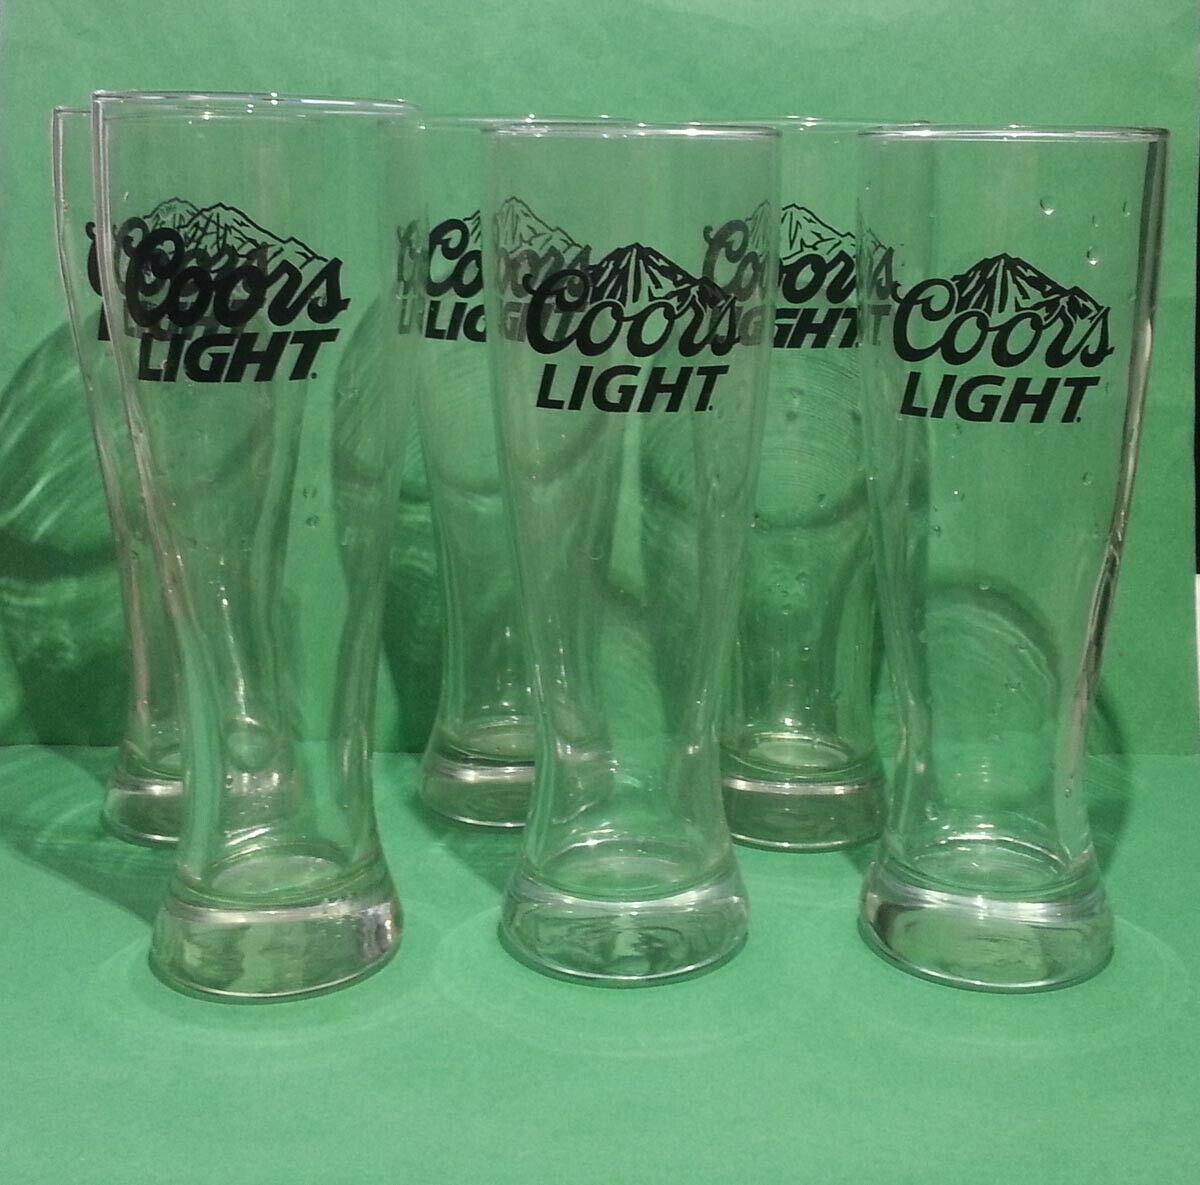 Sale $29.95 https://t.co/JZ3ng6oW7j Coors Light #beer Pilsner Glass 1.5 pint, Set of 6 https://t.co/ObuxdSMVdl